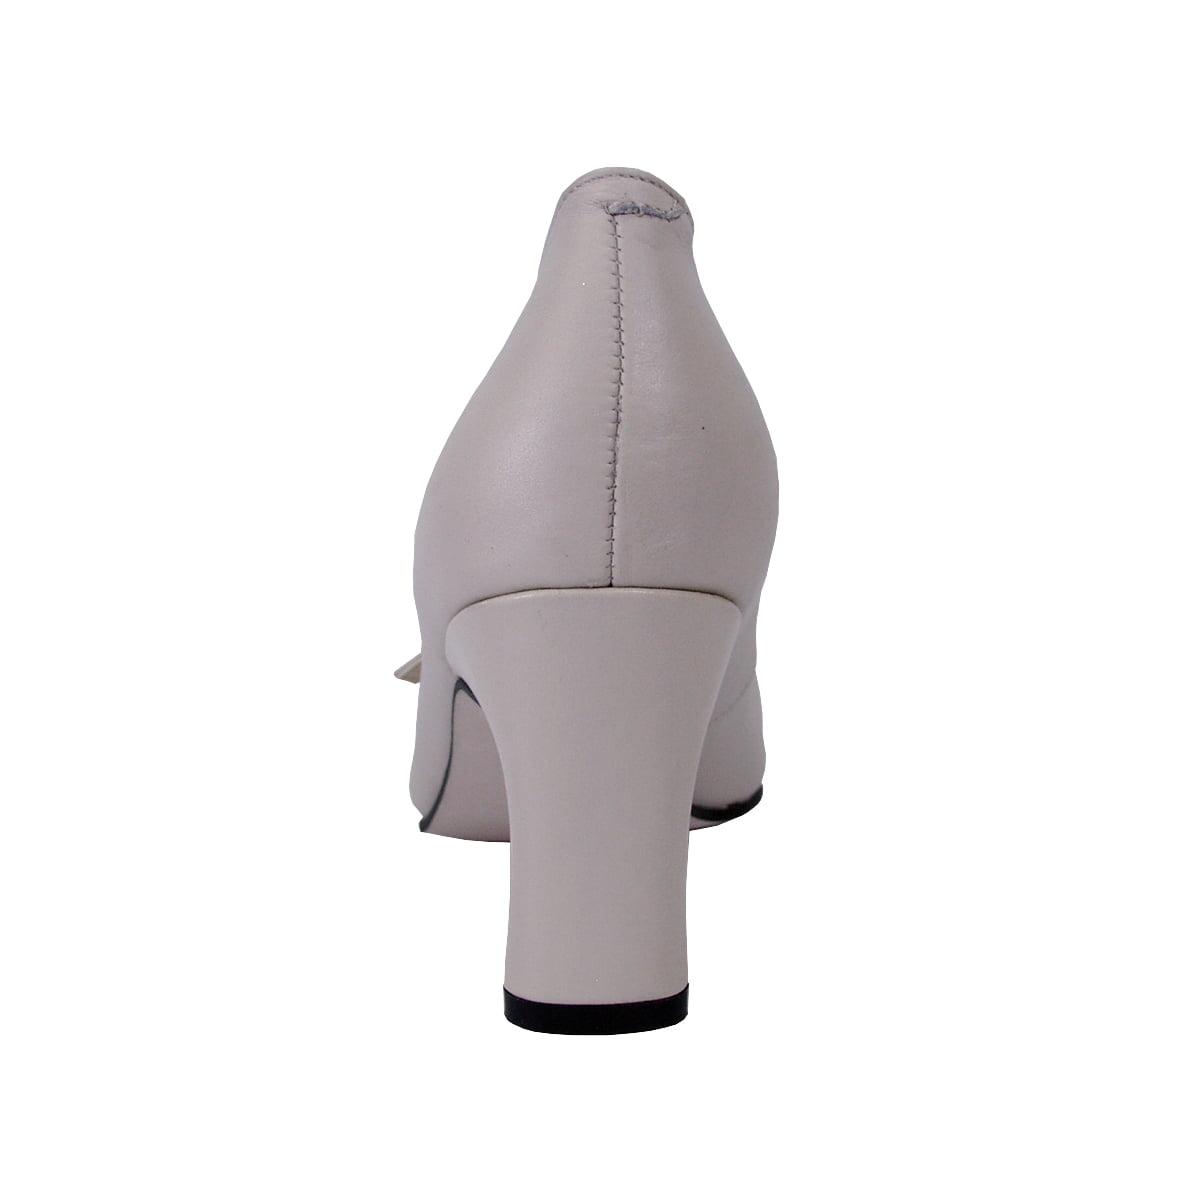 cd3fae5c8bc4 Peerage - Helena Women Wide Width Leather T-Strap Double Buckles High Heel  Pumps - Walmart.com